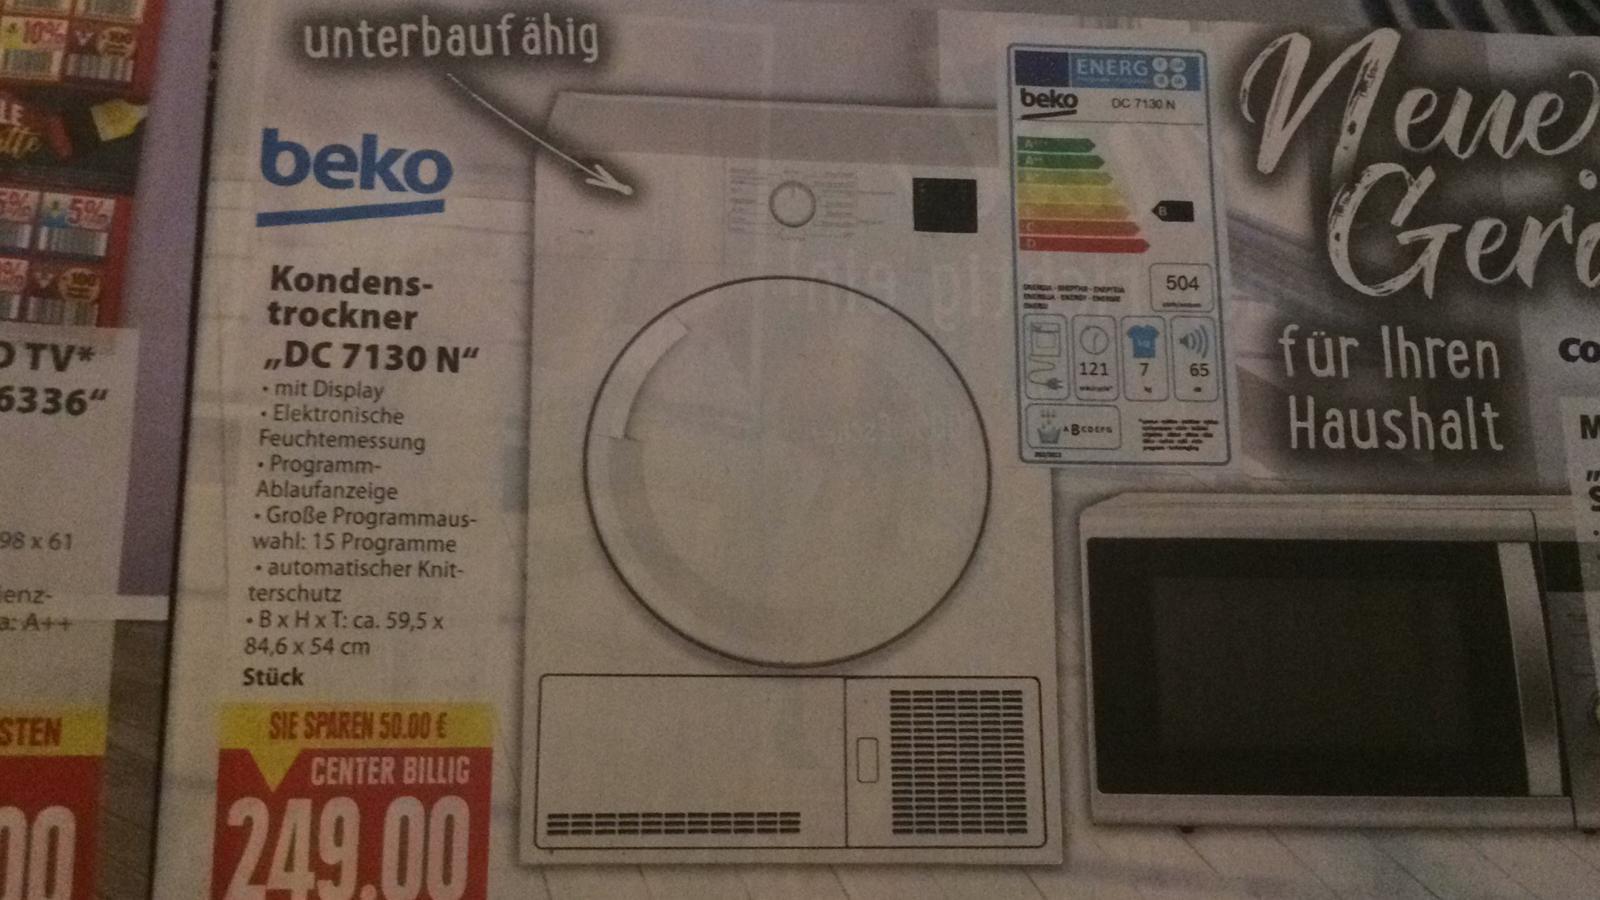 [Lokal Dissen a.T.W.] Beko DC7130N 7 kg Kondenstrockner